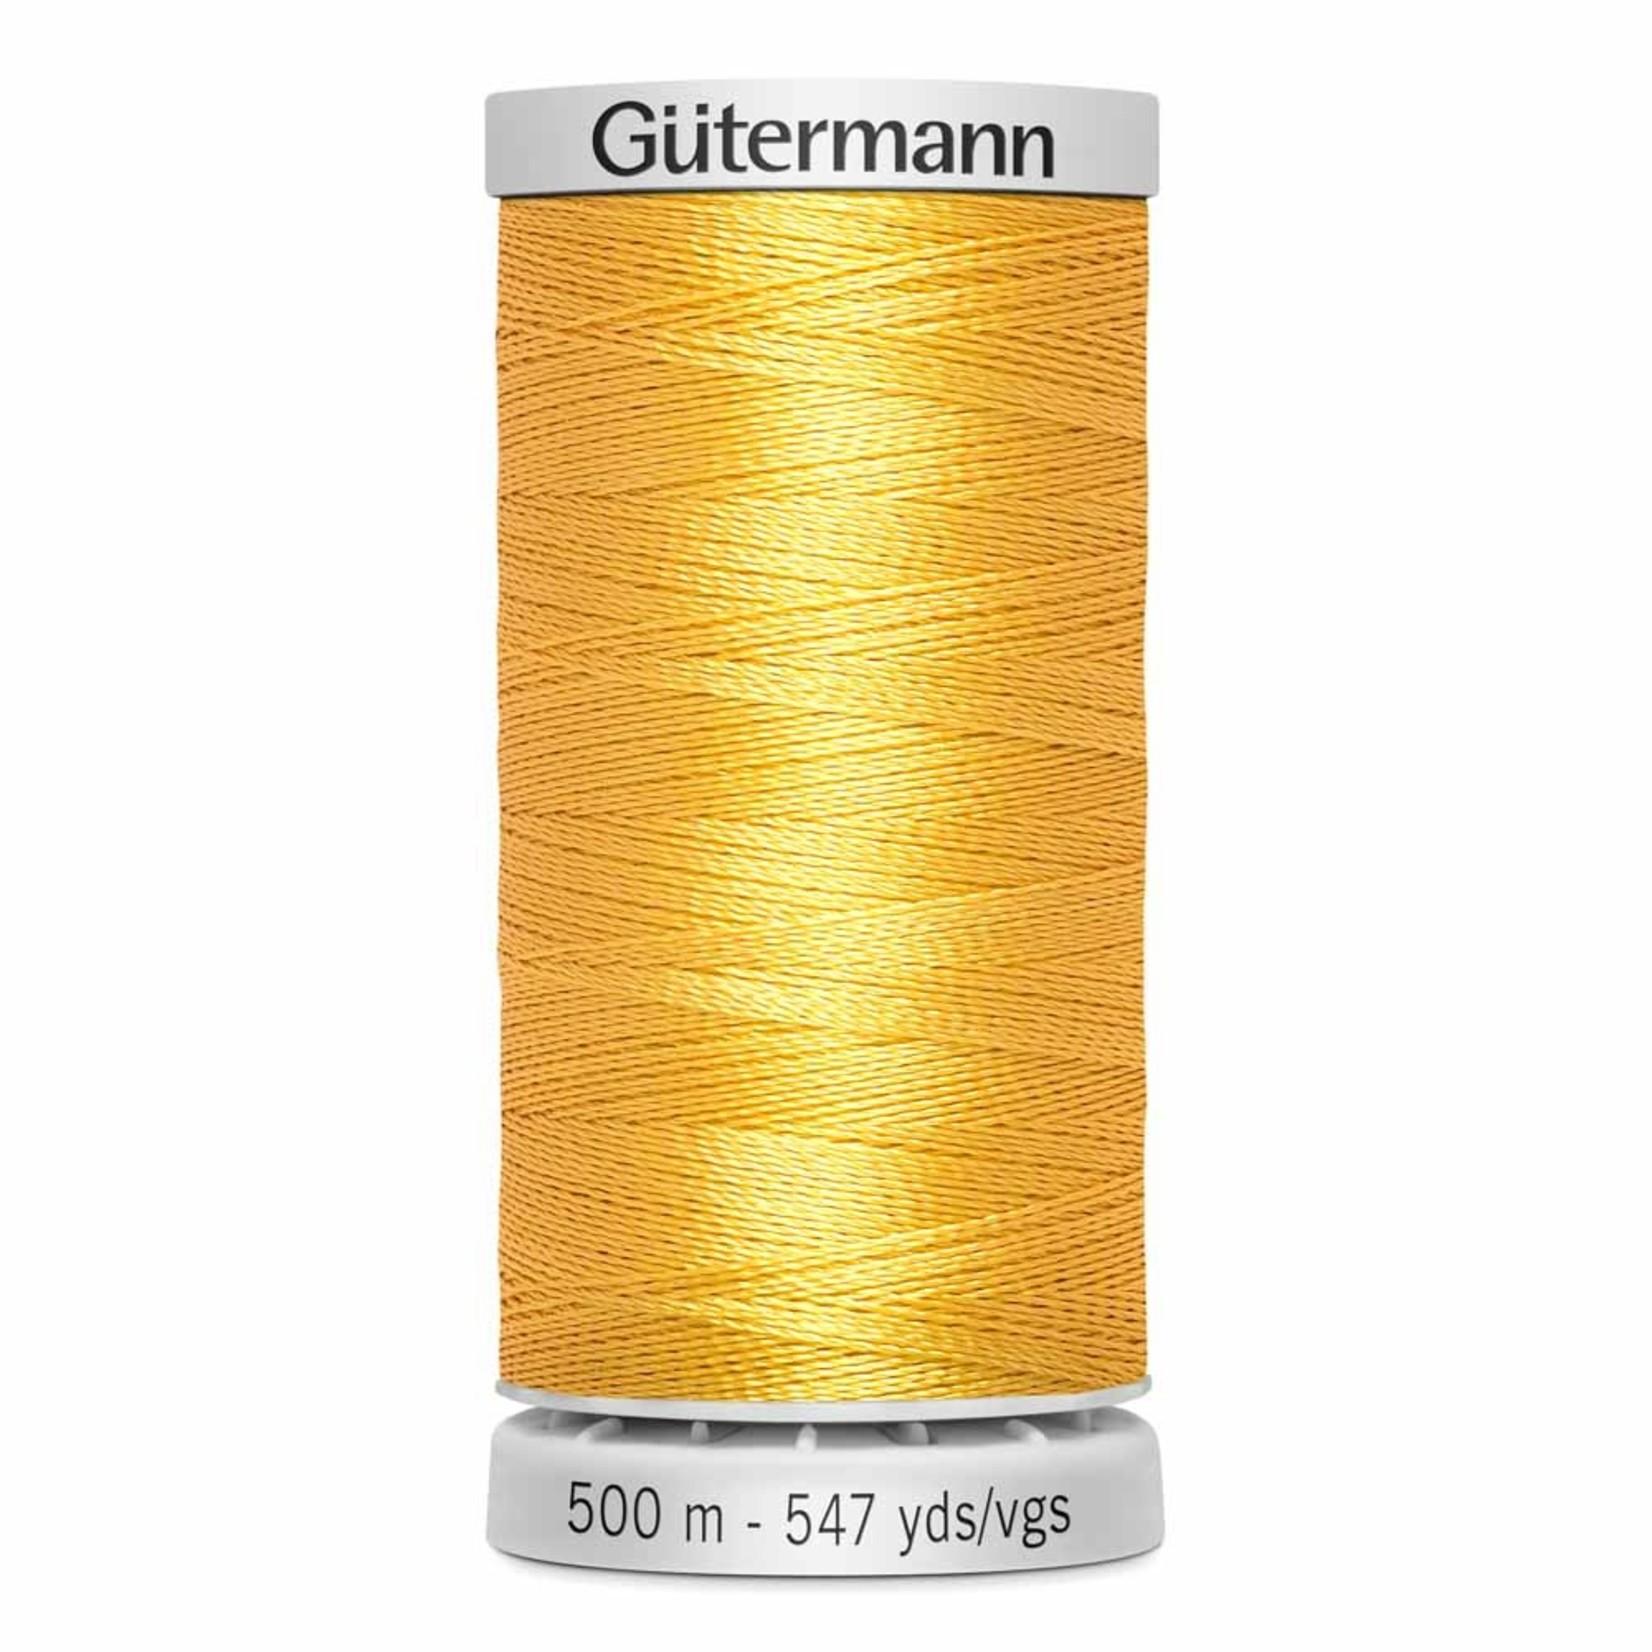 Guterman Col.1850 Gutermann 500m Dekor Rayon Dark Maize